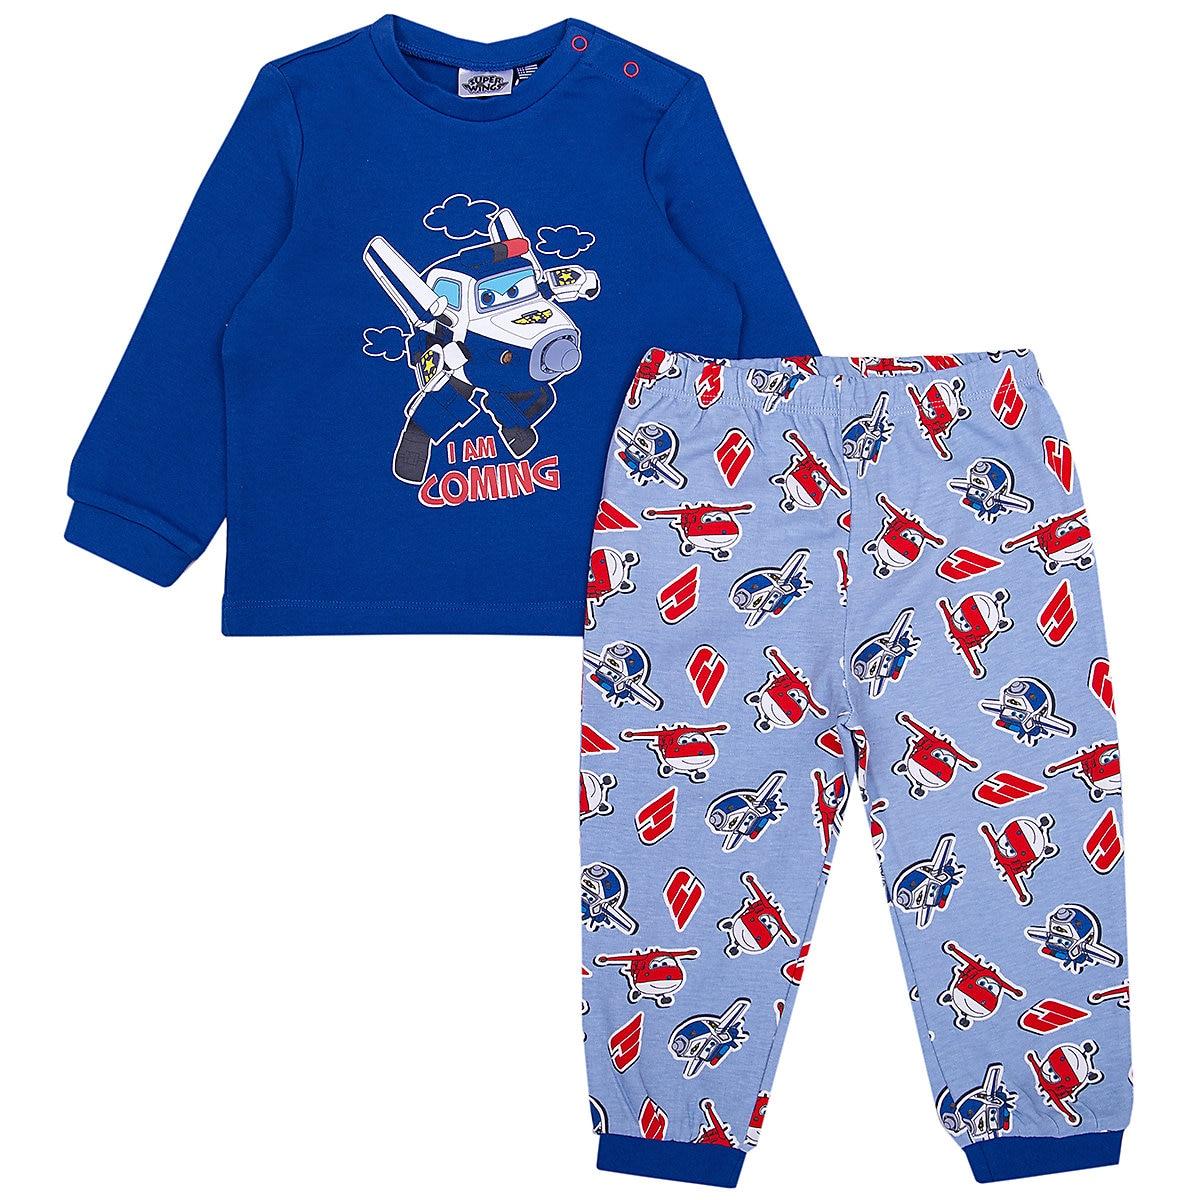 ORIGINAL MARINES Sleepwear & Robes 9501077 Cotton Baby Boys clothing pajamas wu nong wudang tai chi clothing robes uniforms surplices men and women hanfu taijiquan clothing coat winter thick robe